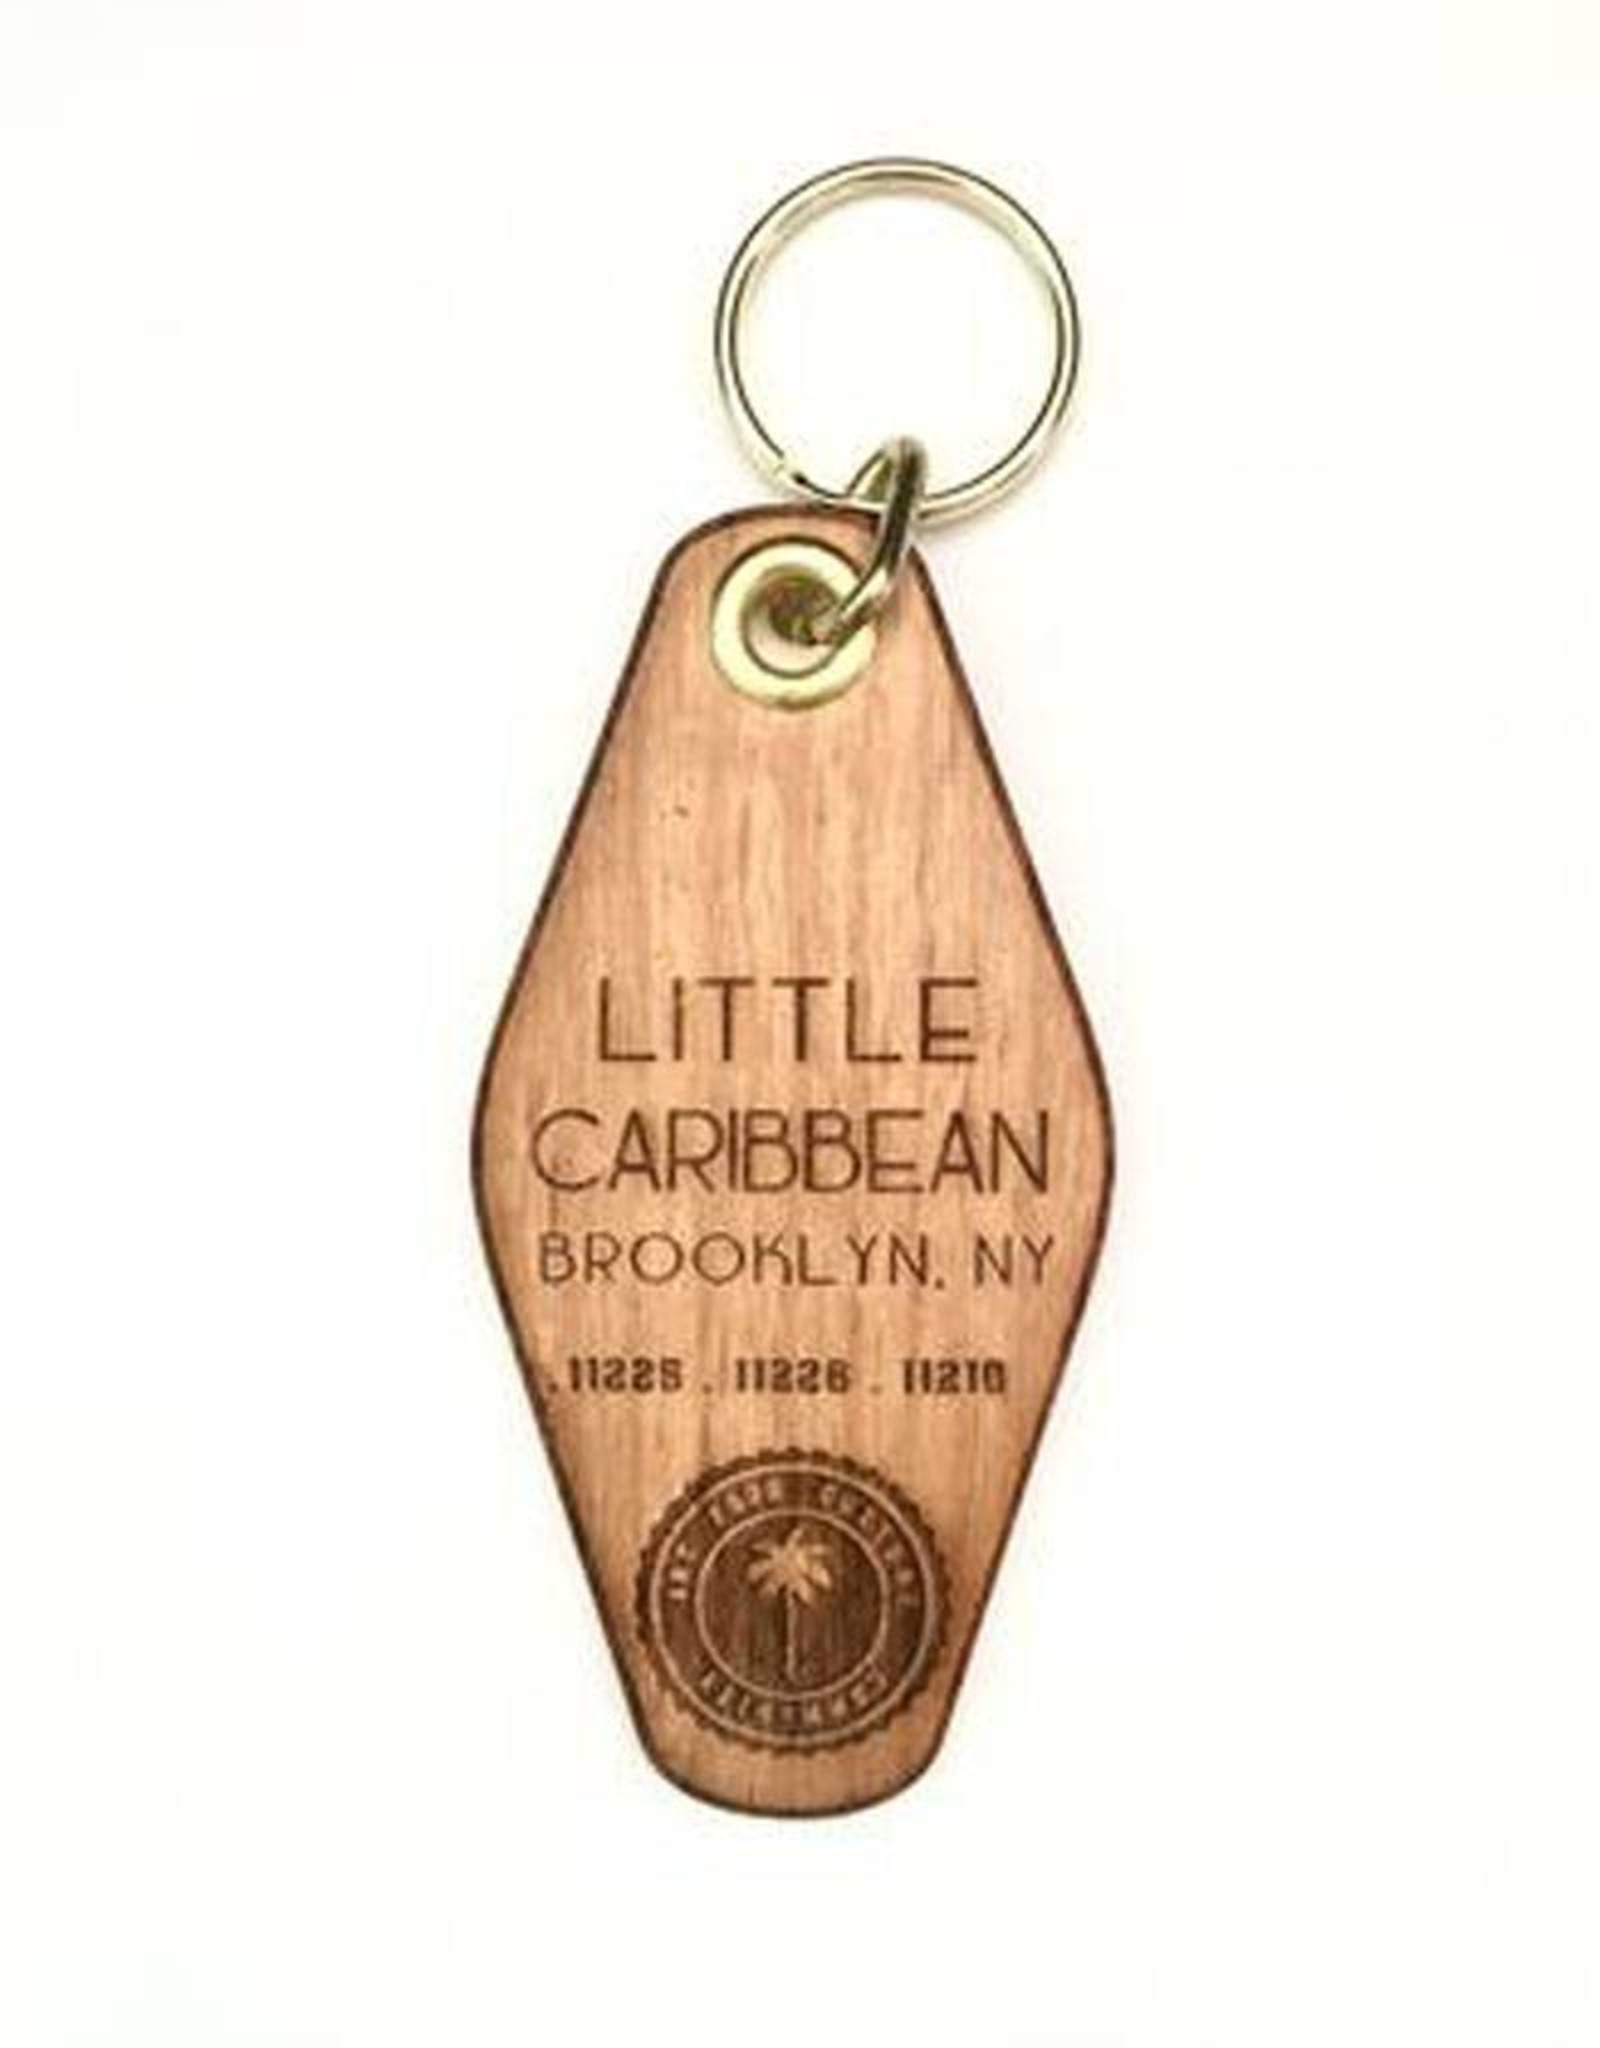 Little Caribbean Keychains